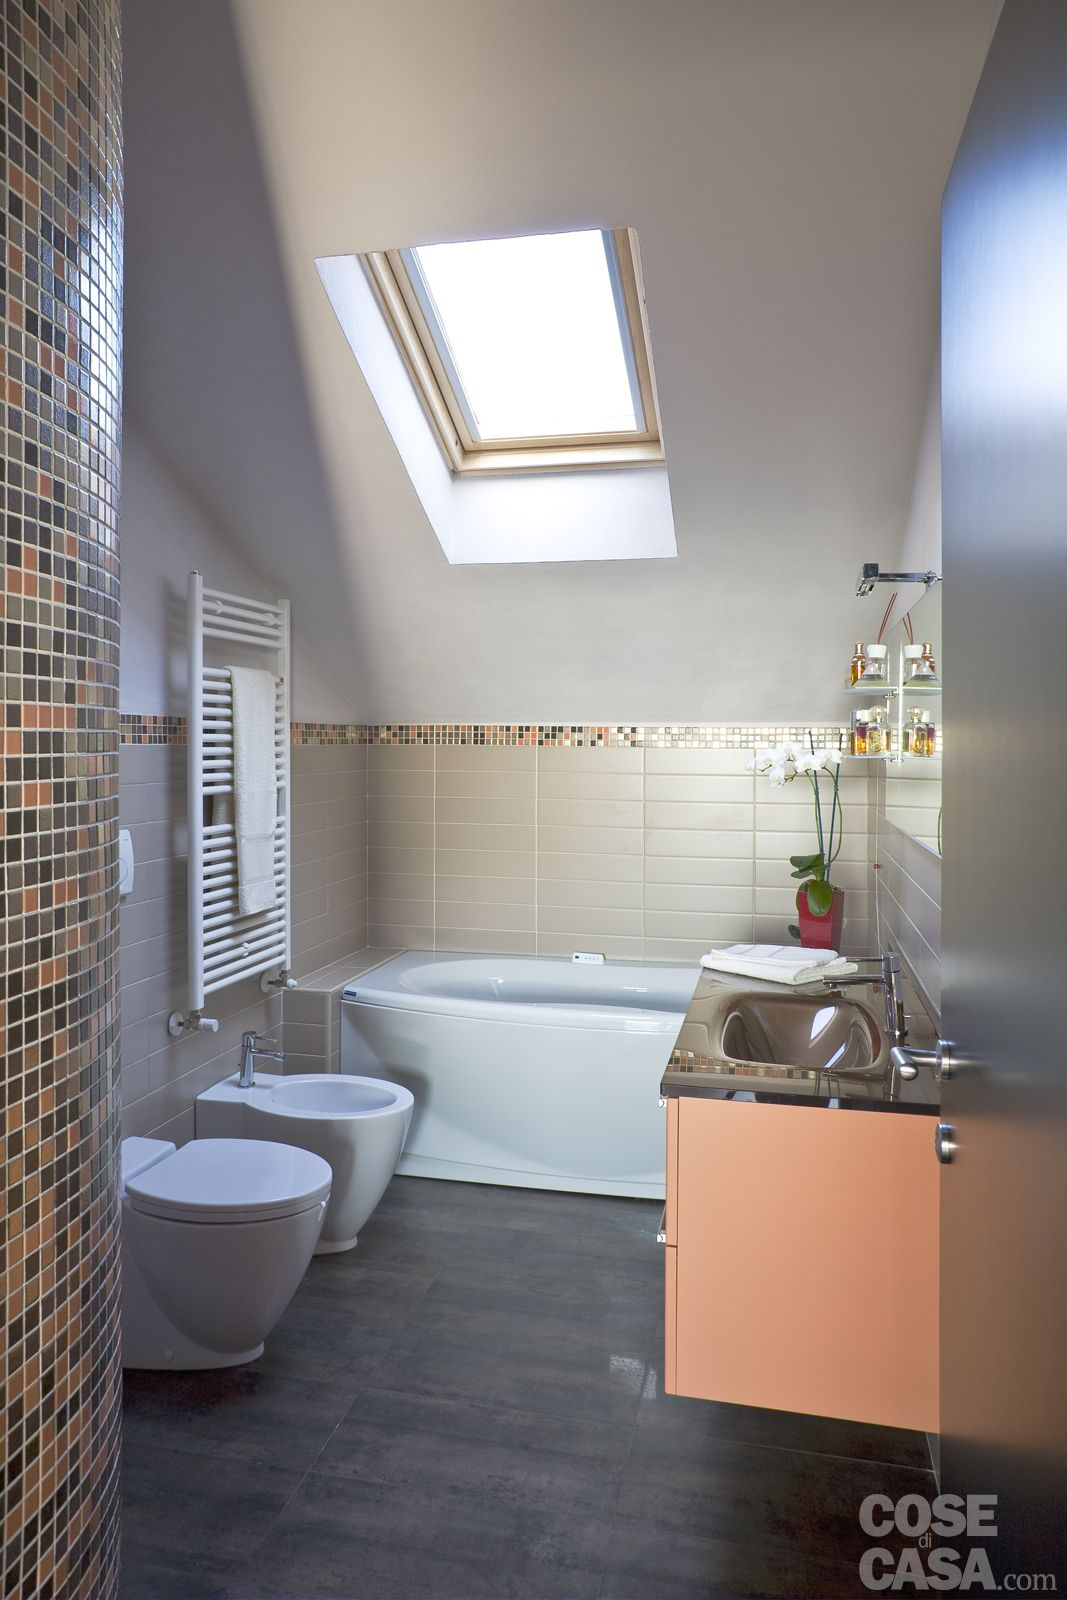 Casa in mansarda con le soluzioni giuste per gli spazi bassi mansarde pinterest attic - Bagno in mansarda ...